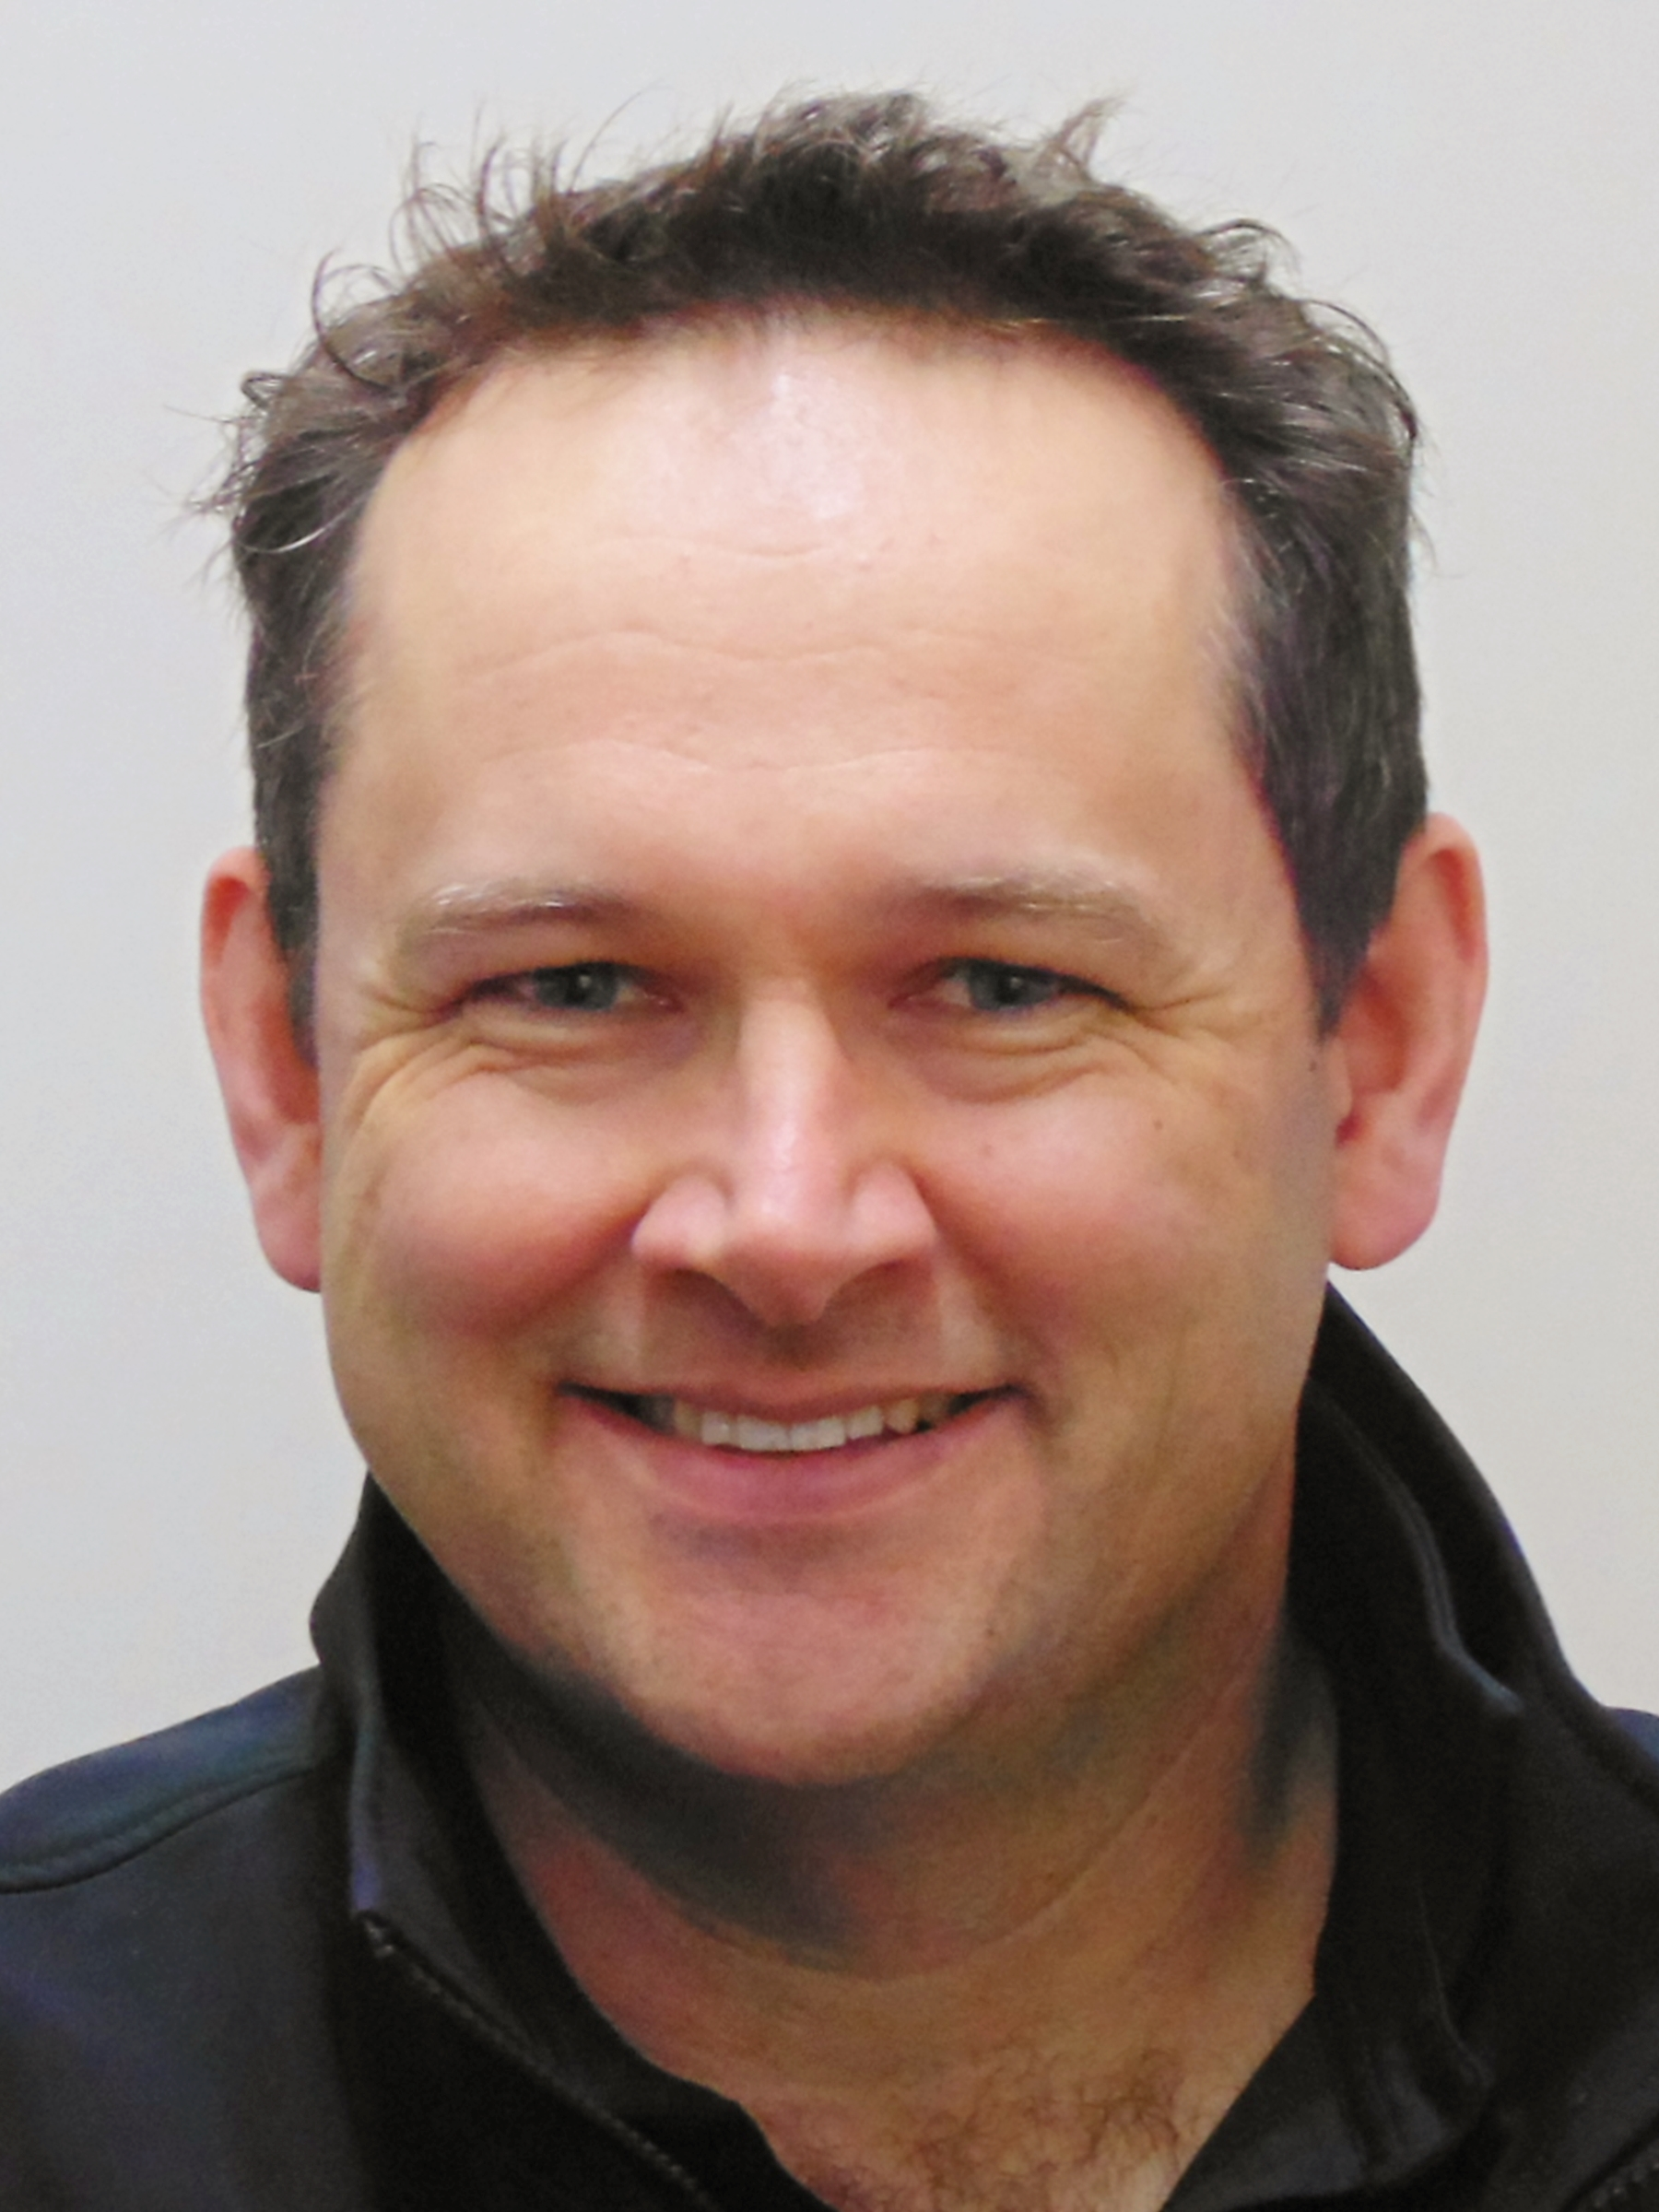 Cameron McLean